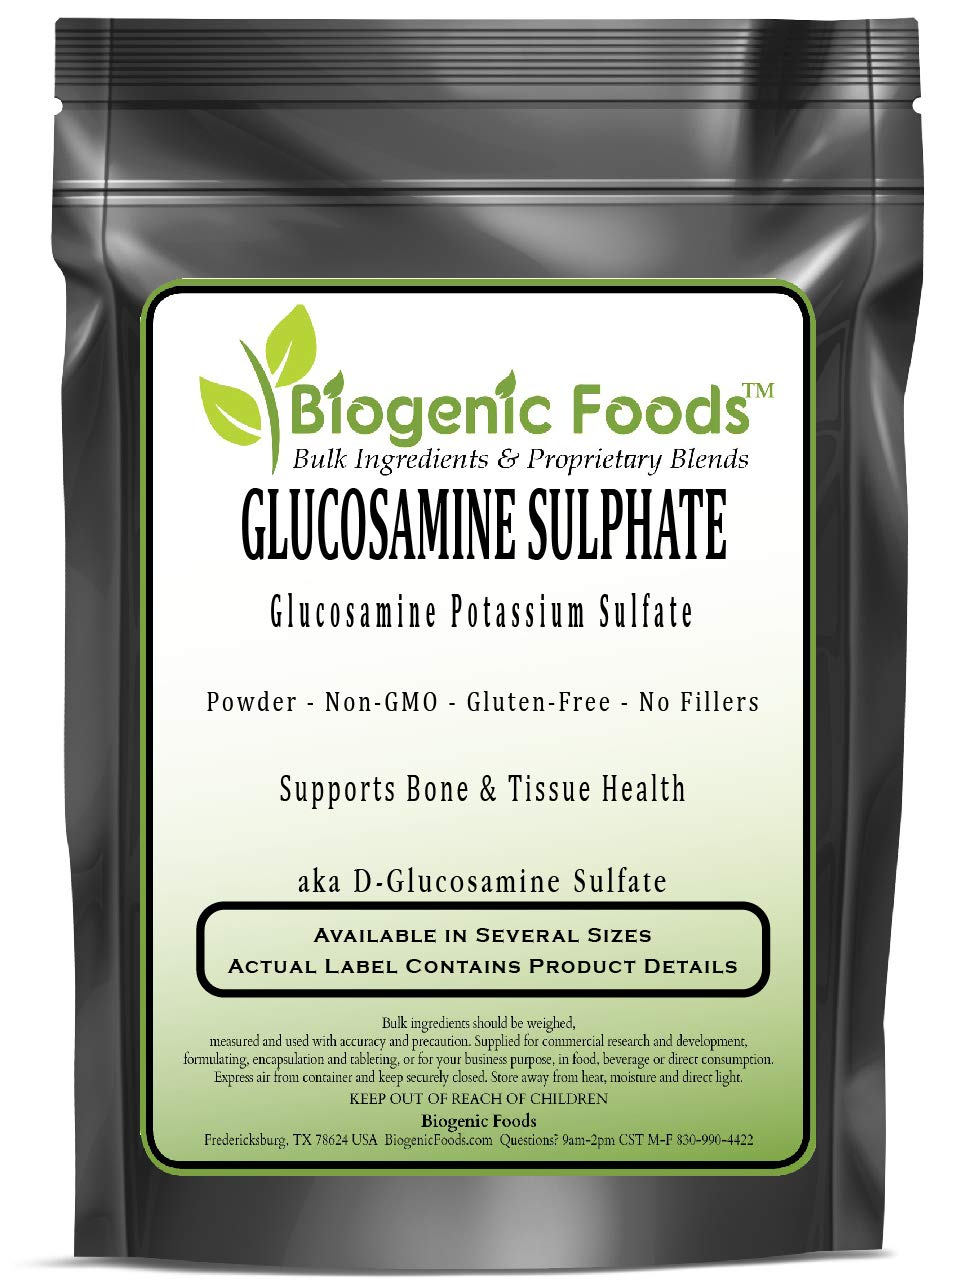 Glucosamine Sulphate - Glucosamine Potassium Sulfate Powder - aka D-Glucosamine Sulfate, 10 kg